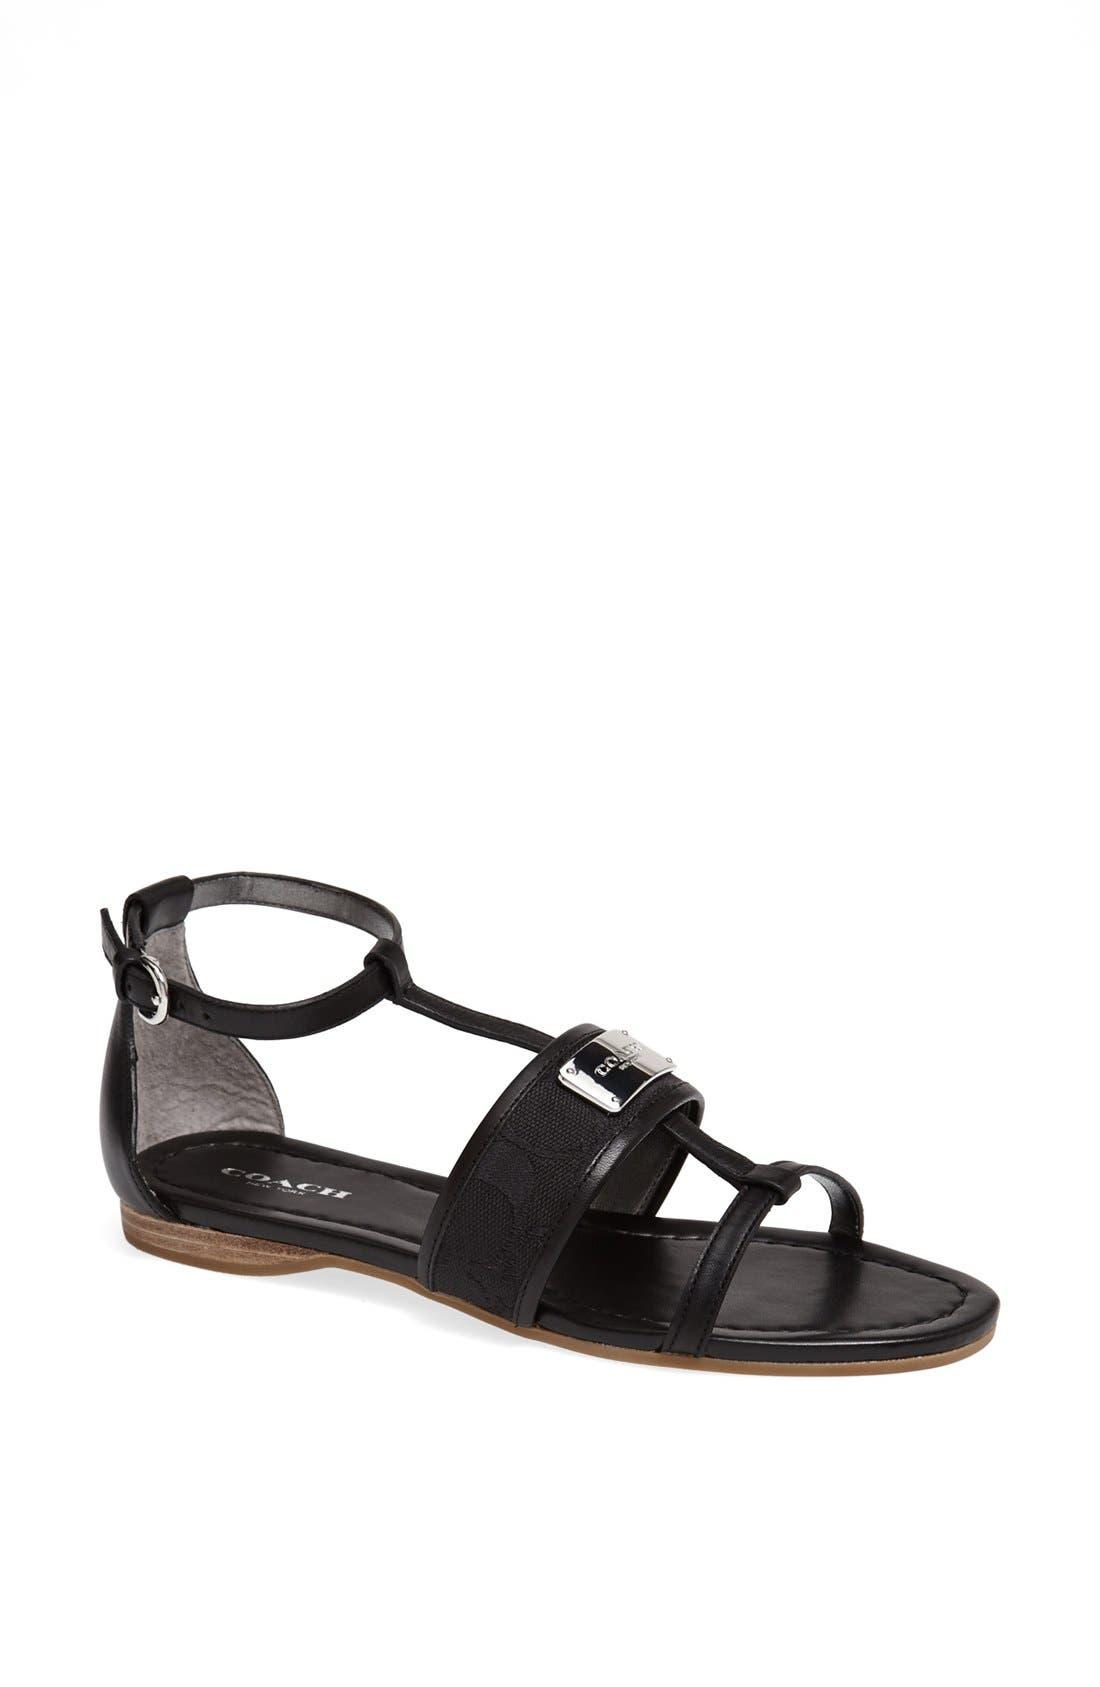 Alternate Image 1 Selected - COACH 'Harriet' Sandal